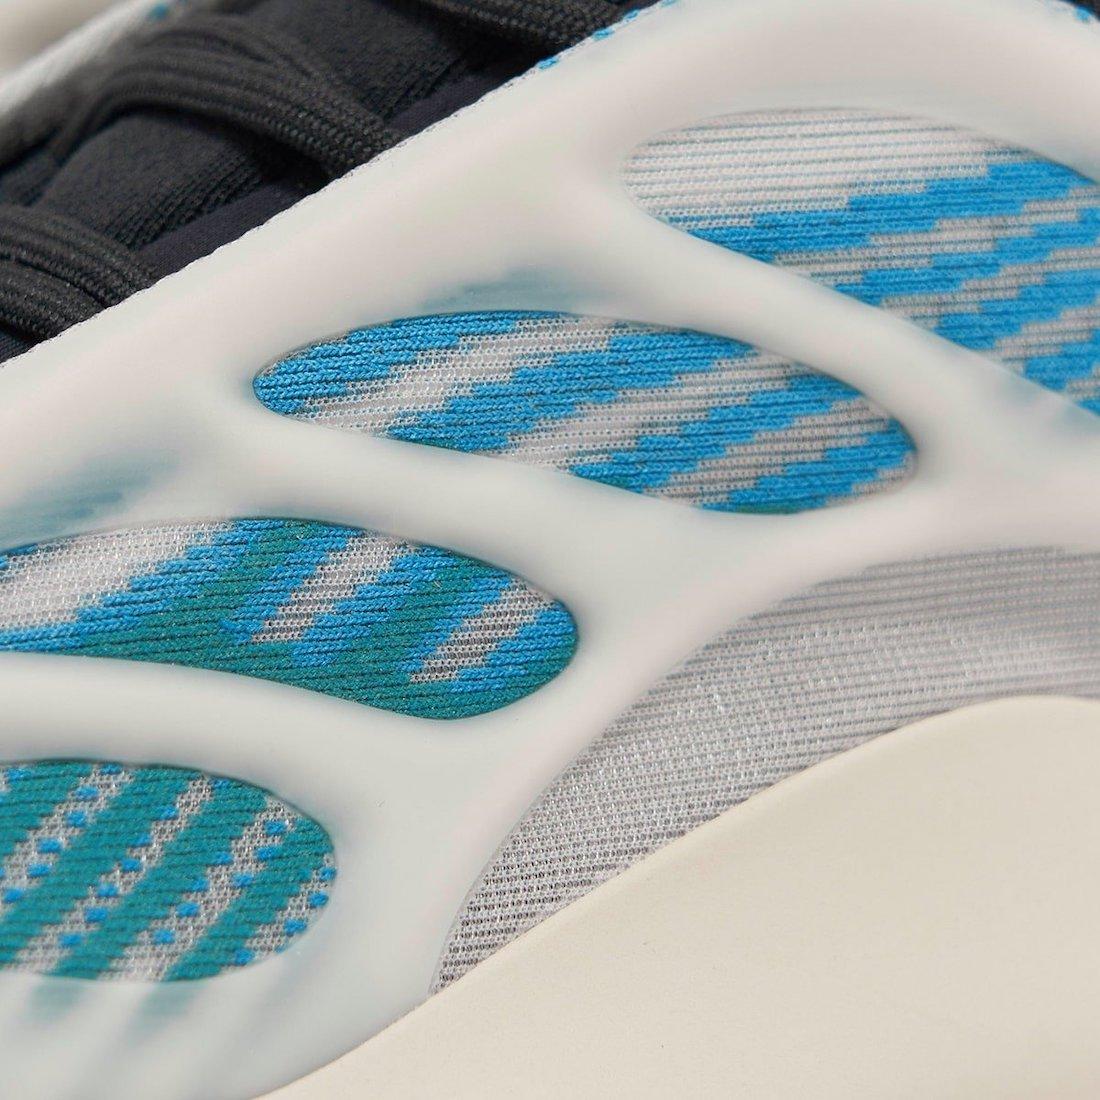 adidas Yeezy 700 V3 Kyanite Release Date